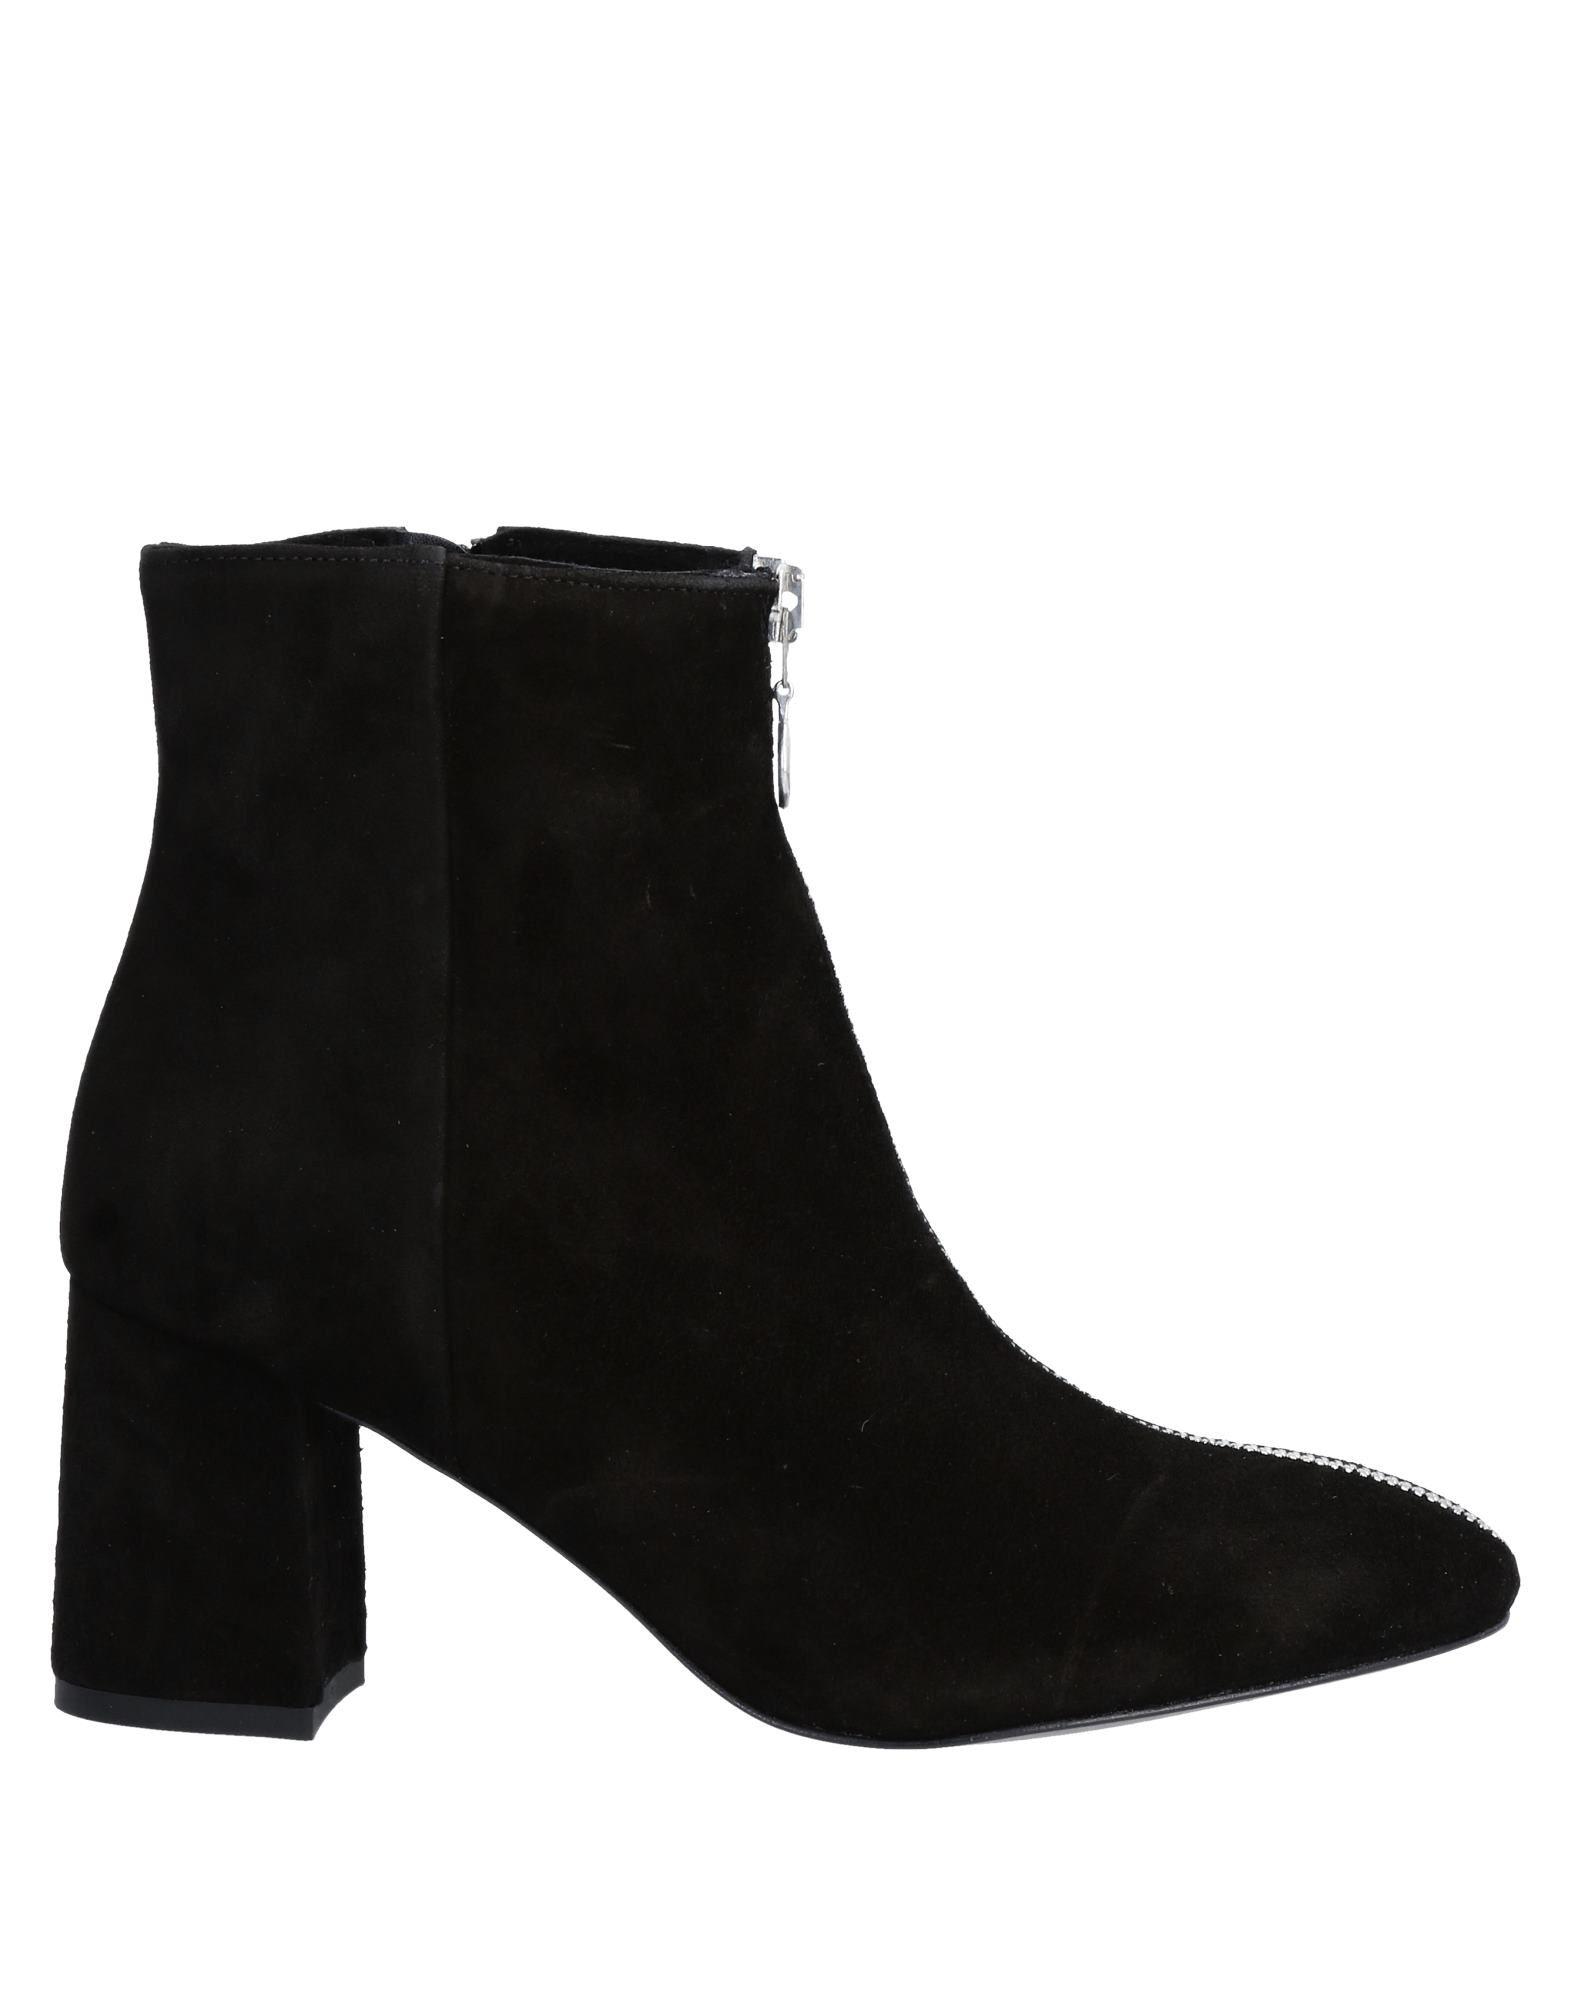 Rebecca Minkoff Ankle boot